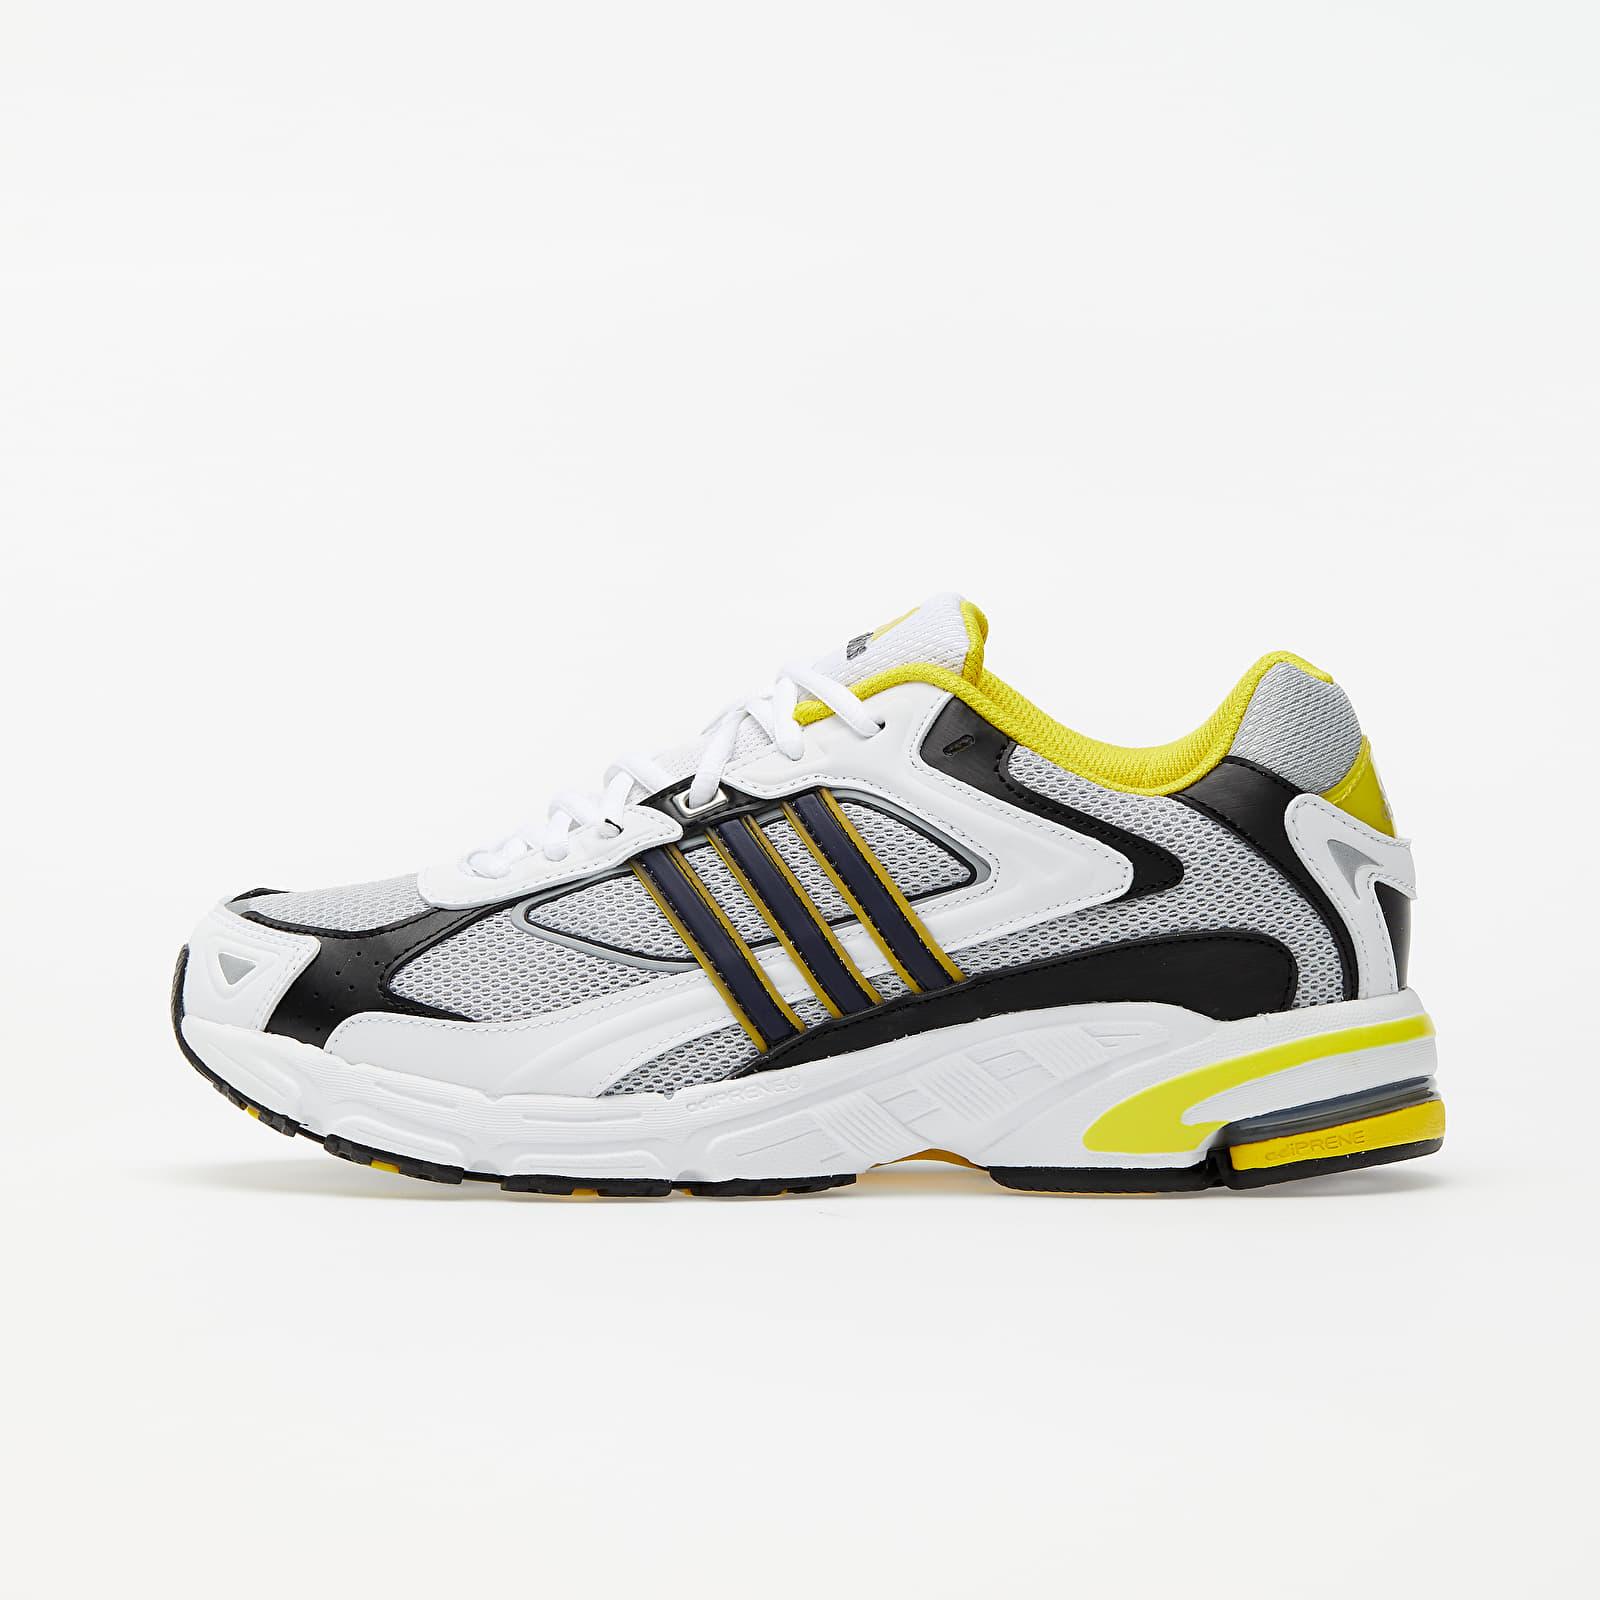 Încălțăminte și sneakerși pentru bărbați adidas Response CL Ftwr White/ Core Black/ Yellow